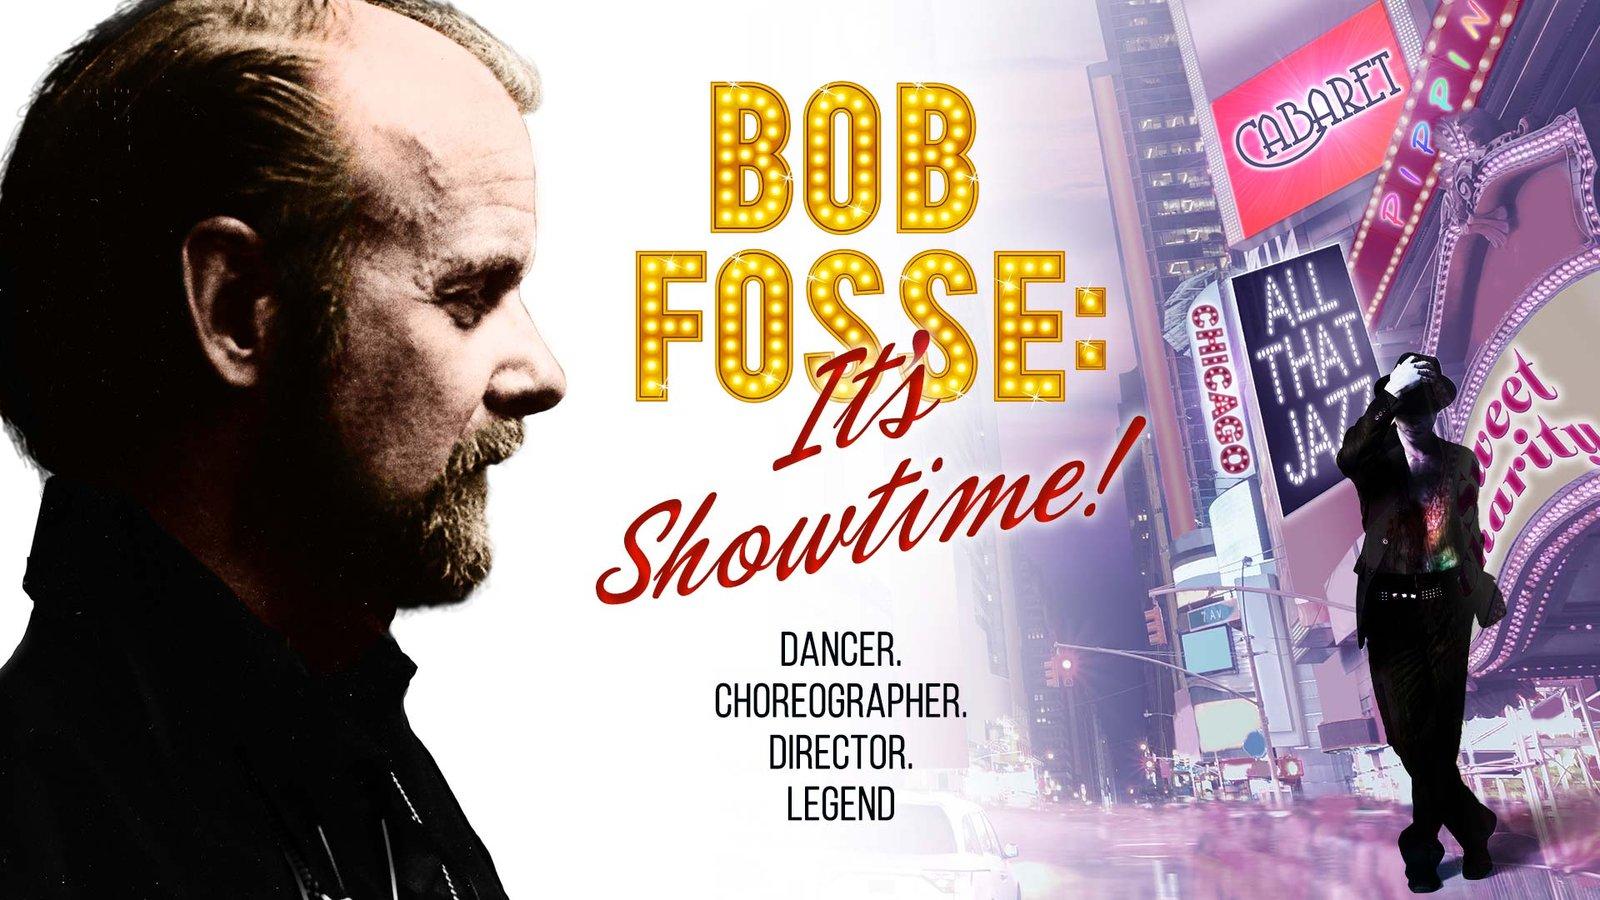 Bob Fosse: It's Showtime